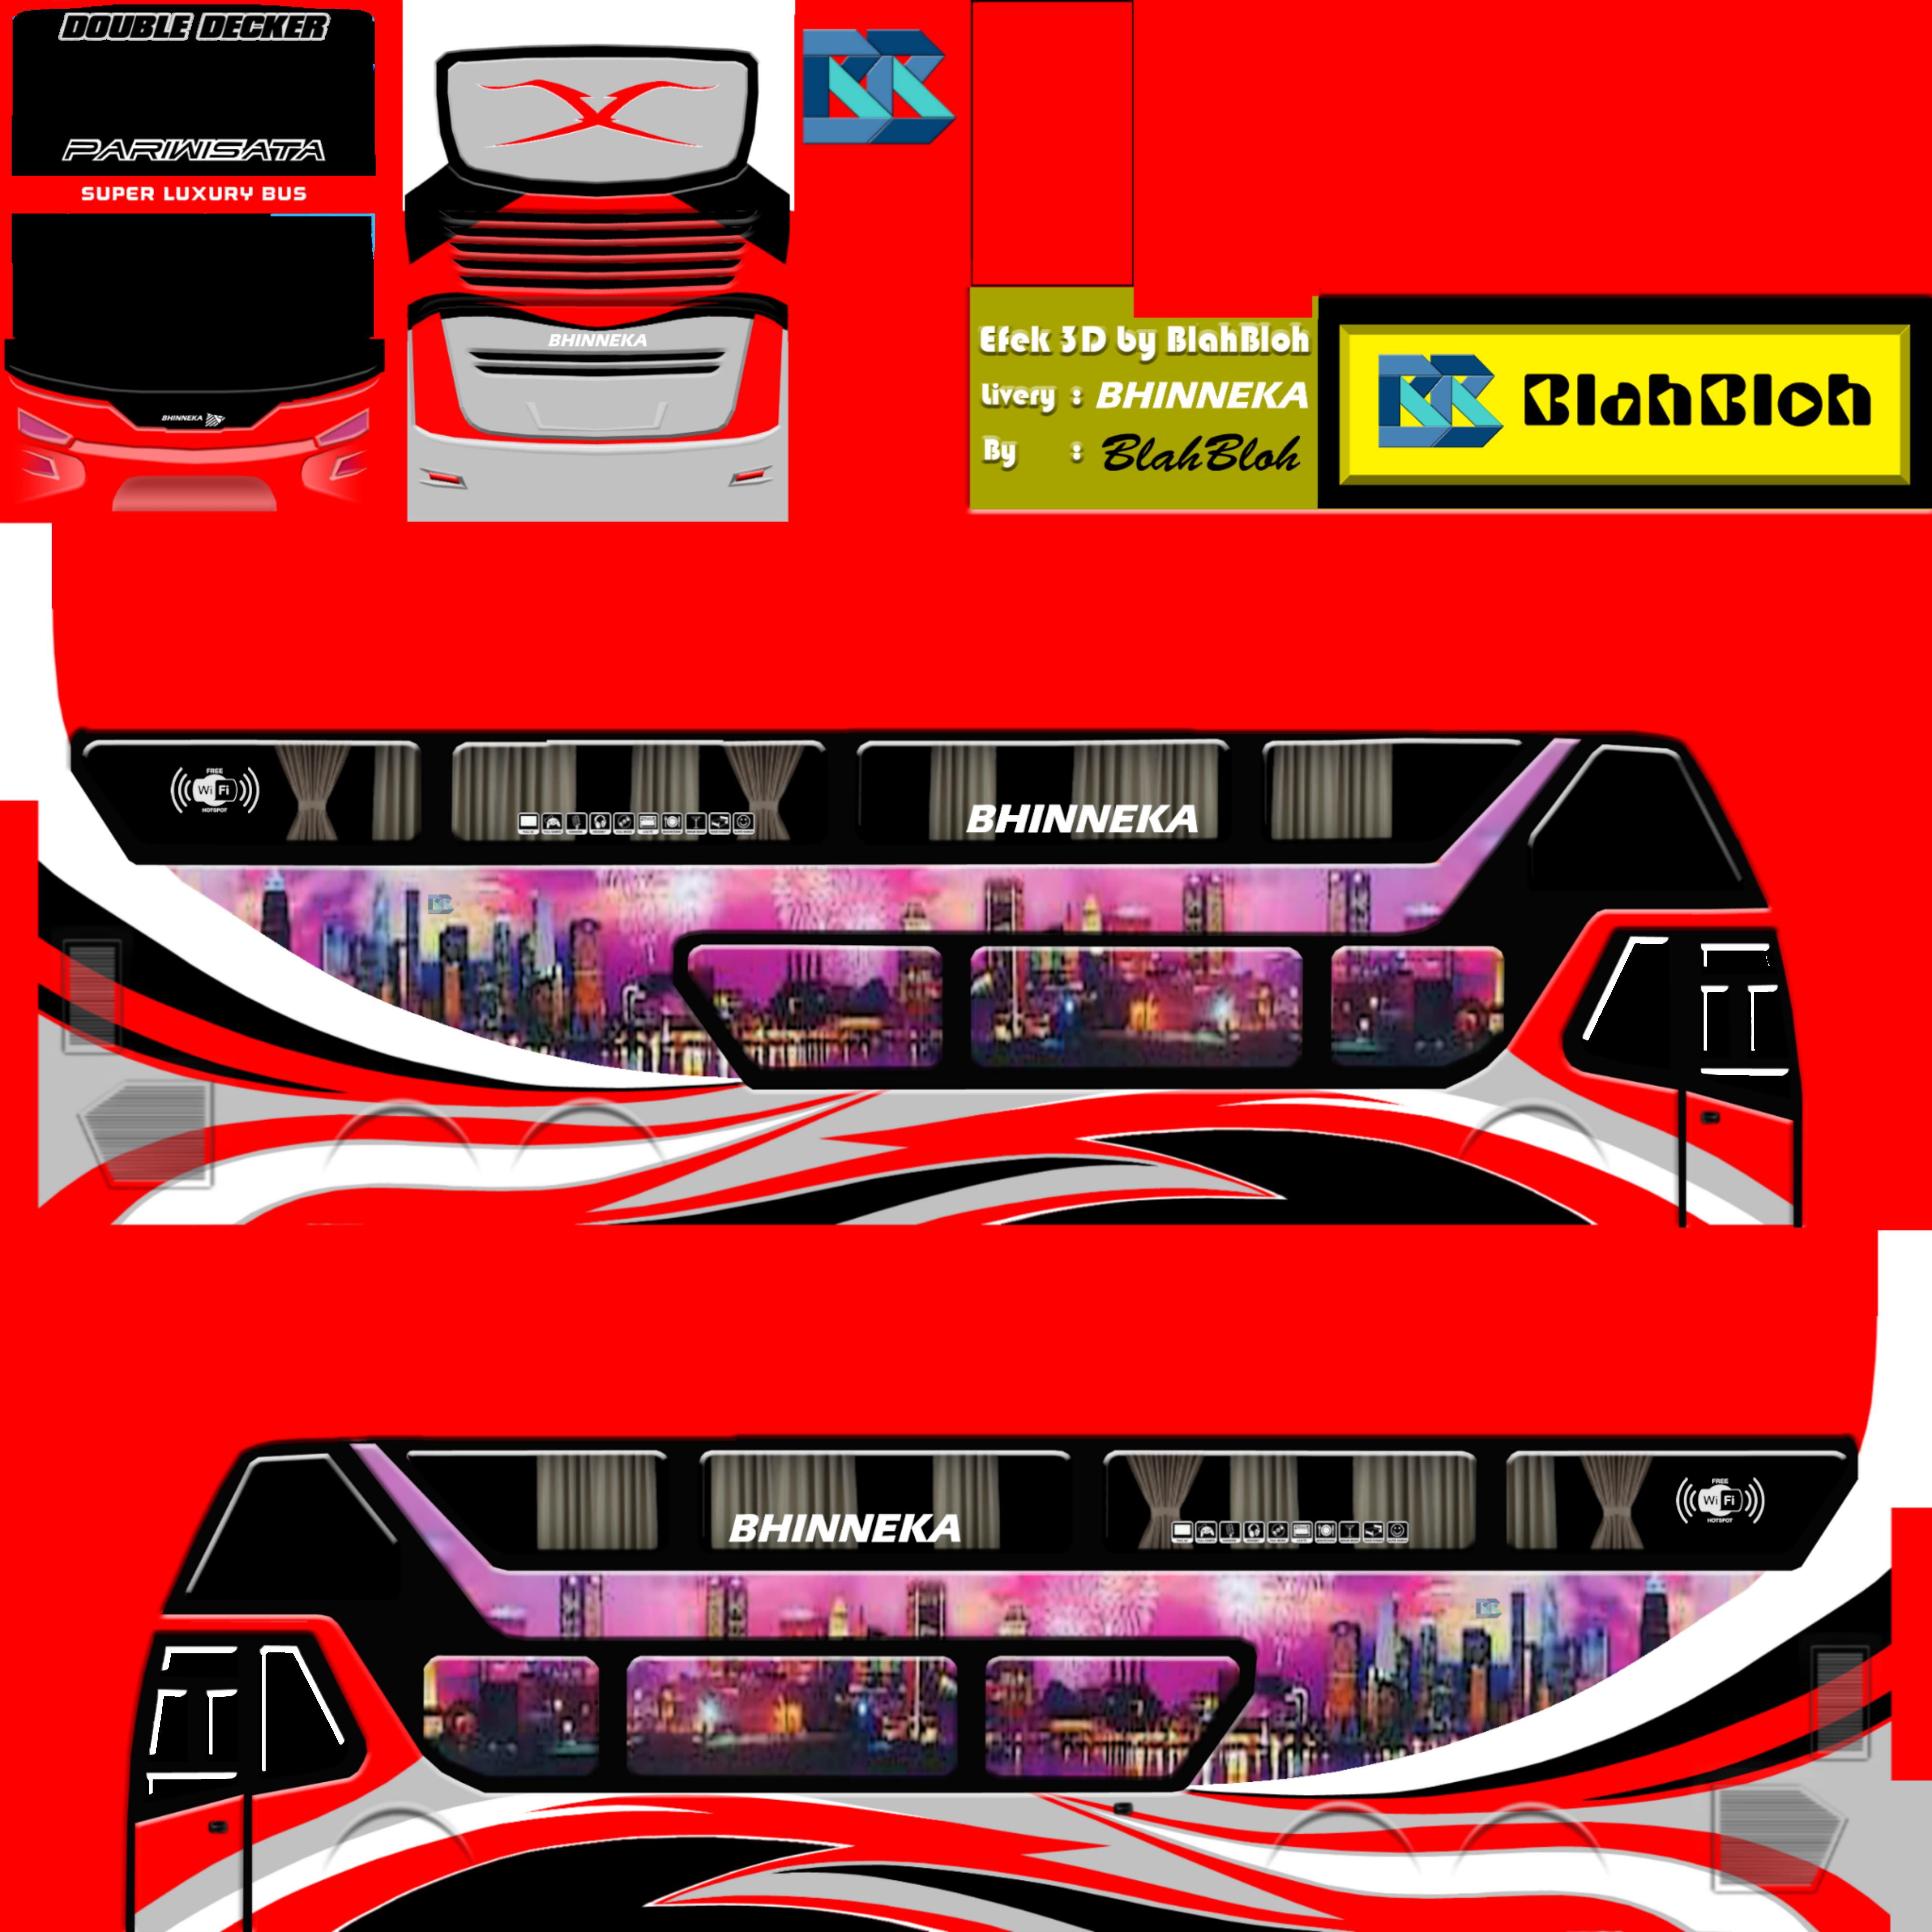 30 Livery Bussid Bimasena Sdd Terbaru Kualitas Jernih Png Konsep Mobil Mobil Futuristik Mobil Modifikasi